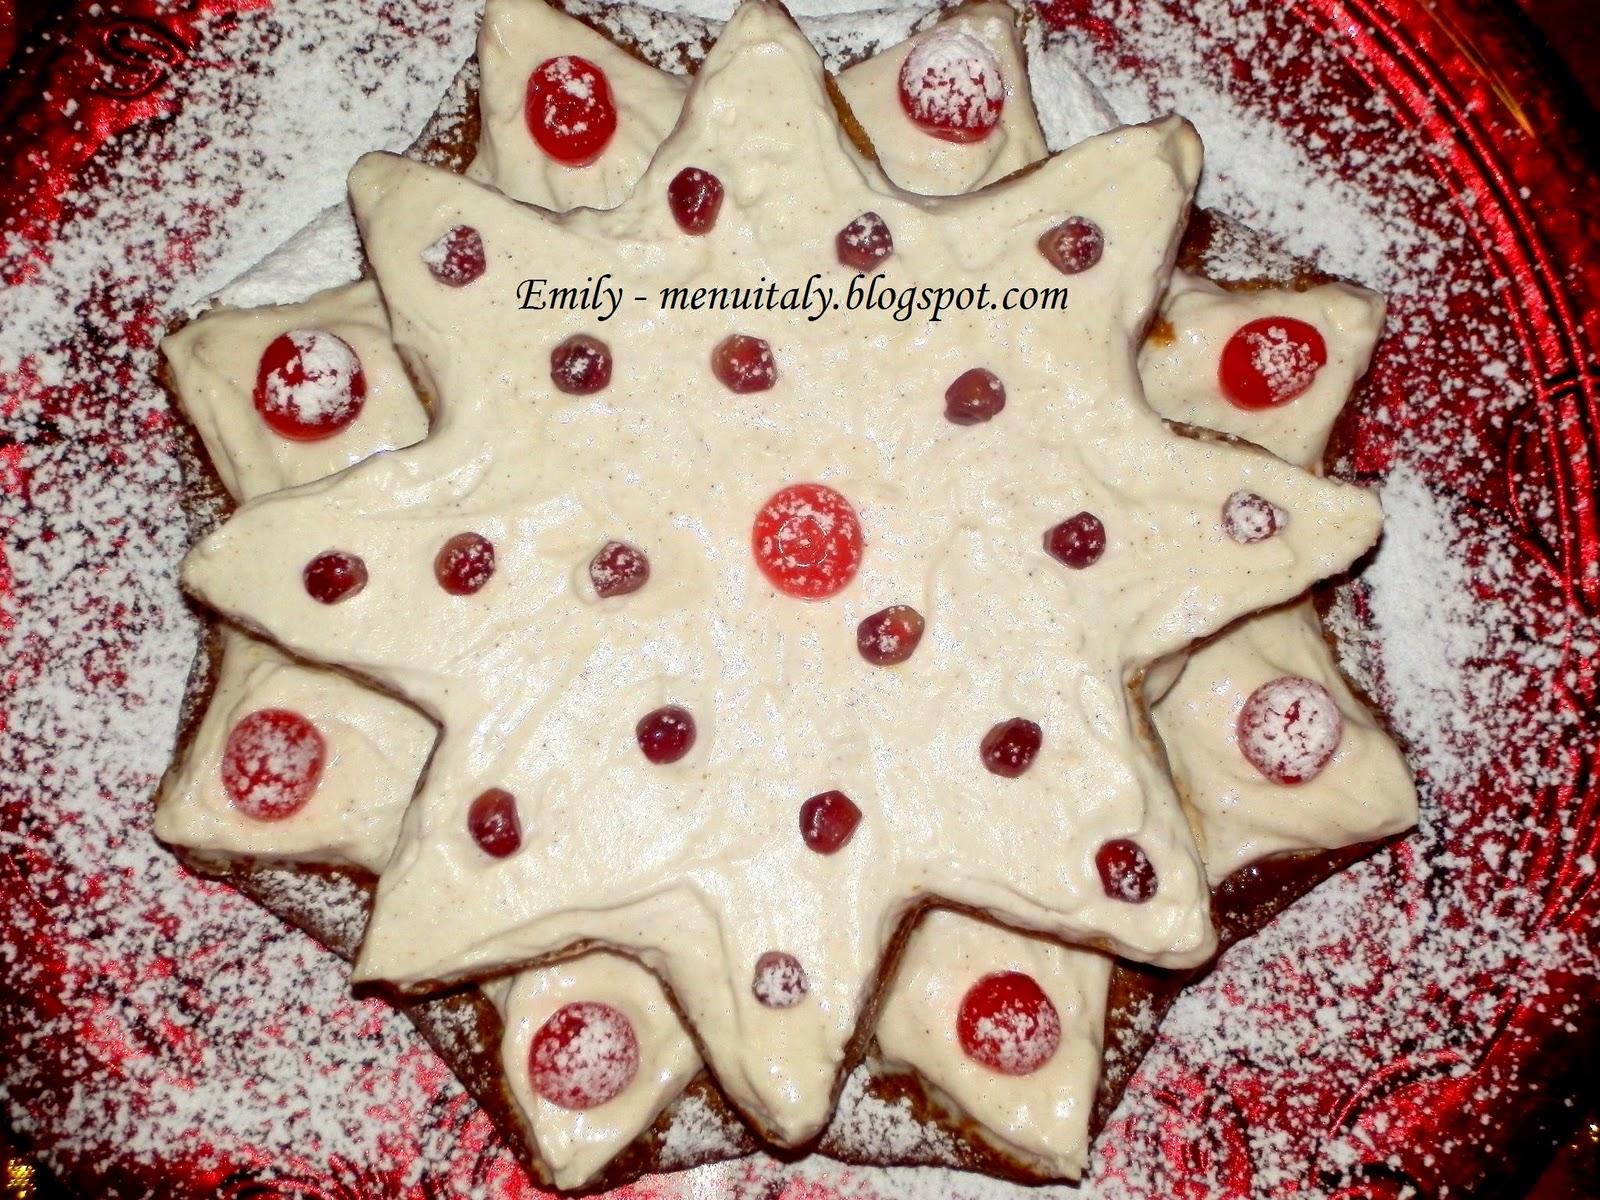 Dolce Stella Di Natale Ingredienti.Emily S Menu Italy Crema Di Ricotta Per La Torta Stella Di Natale